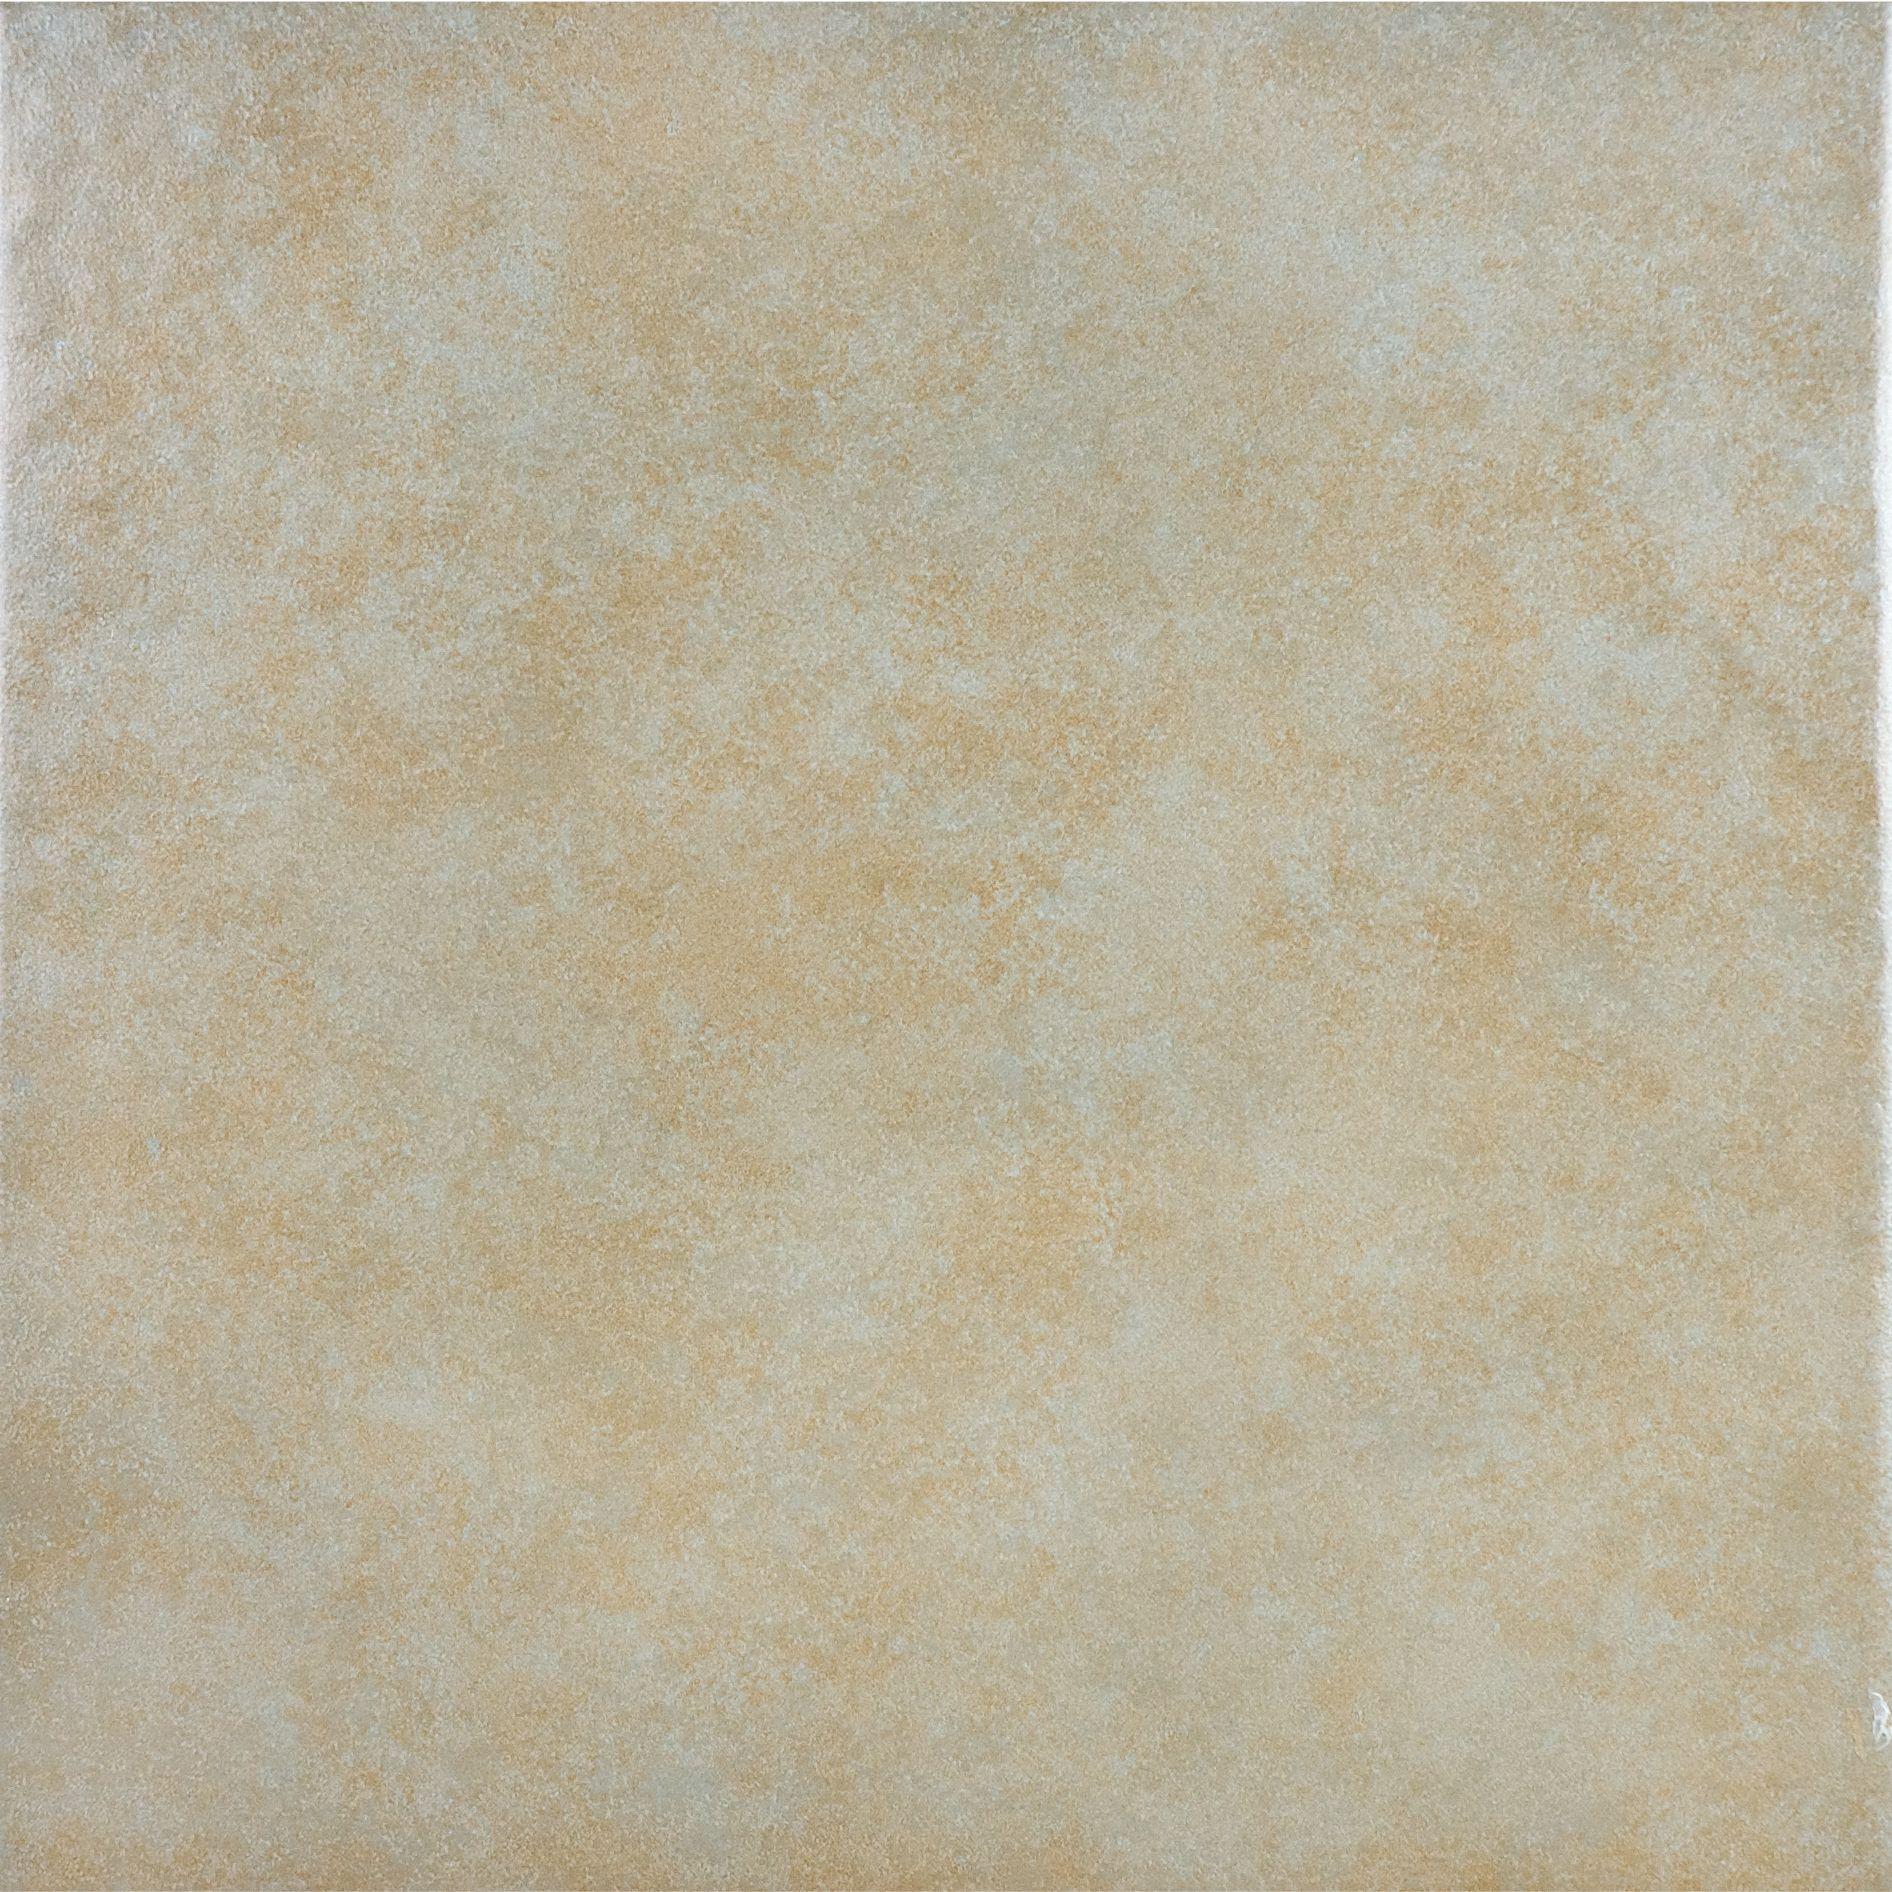 13 X13 Rustica Green Floor Tile Ceramic Tile Clearance Monocottura